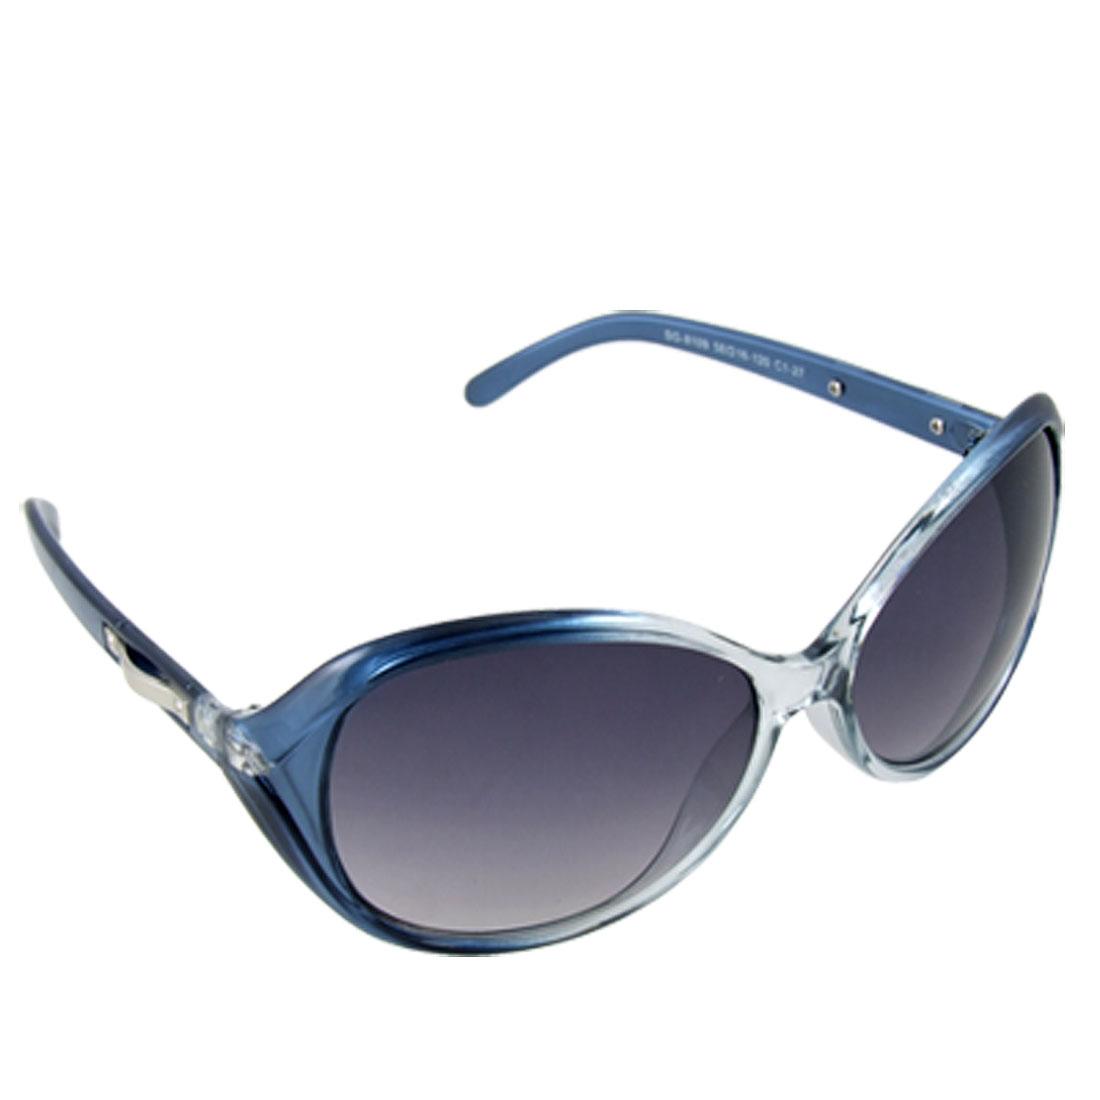 Ladies Sports Full Rim Frame Plastic UV Protection Sunglasses Blue